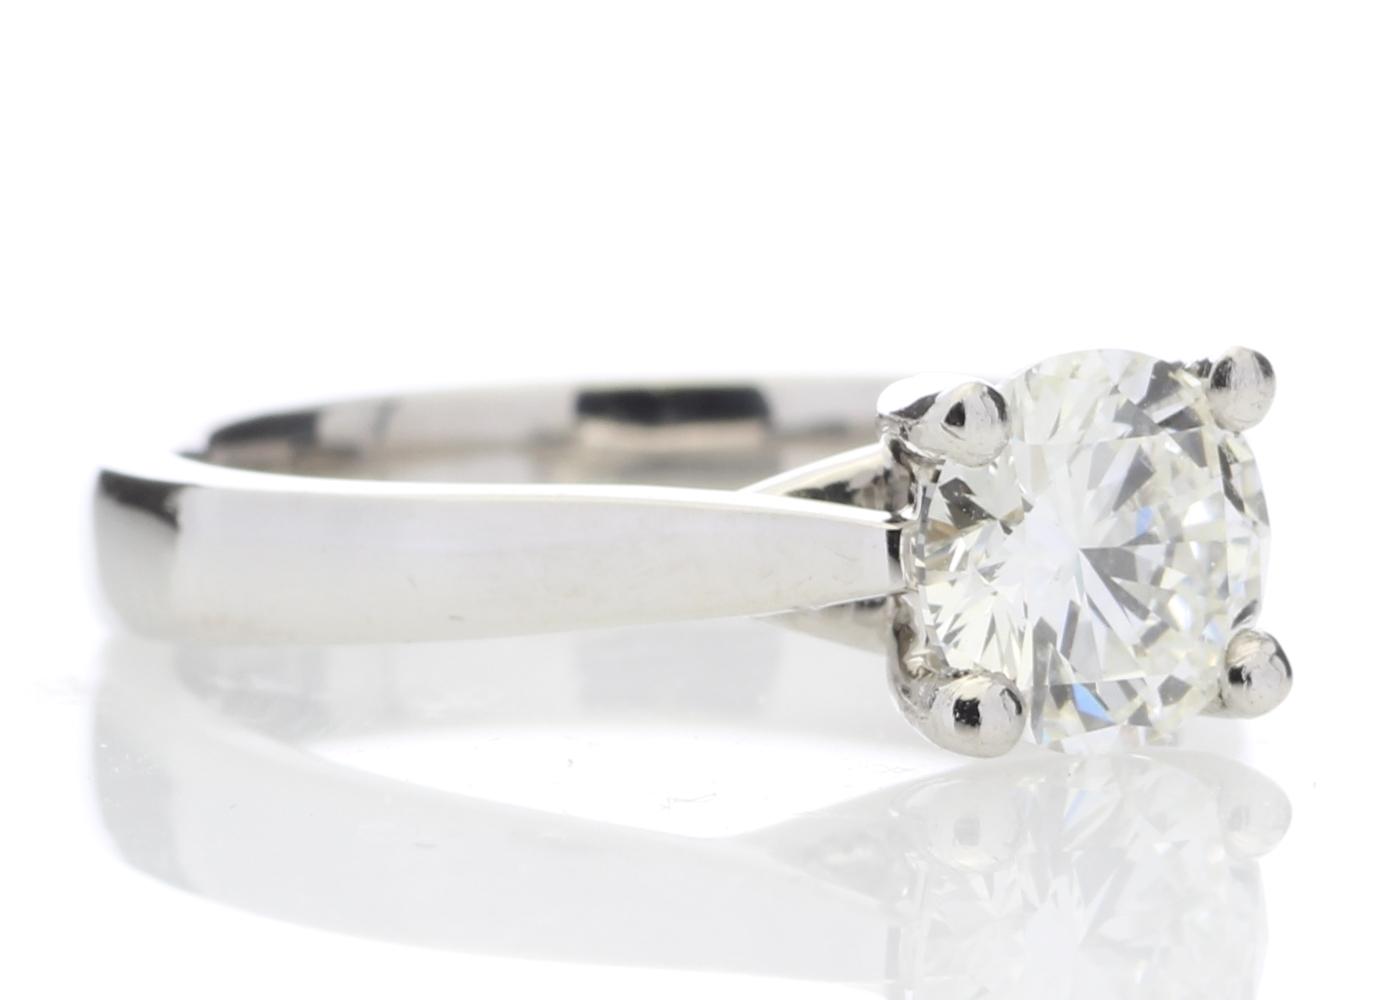 Platinum Single Stone Wire Set Diamond Ring 1.01 Carats - Image 4 of 5